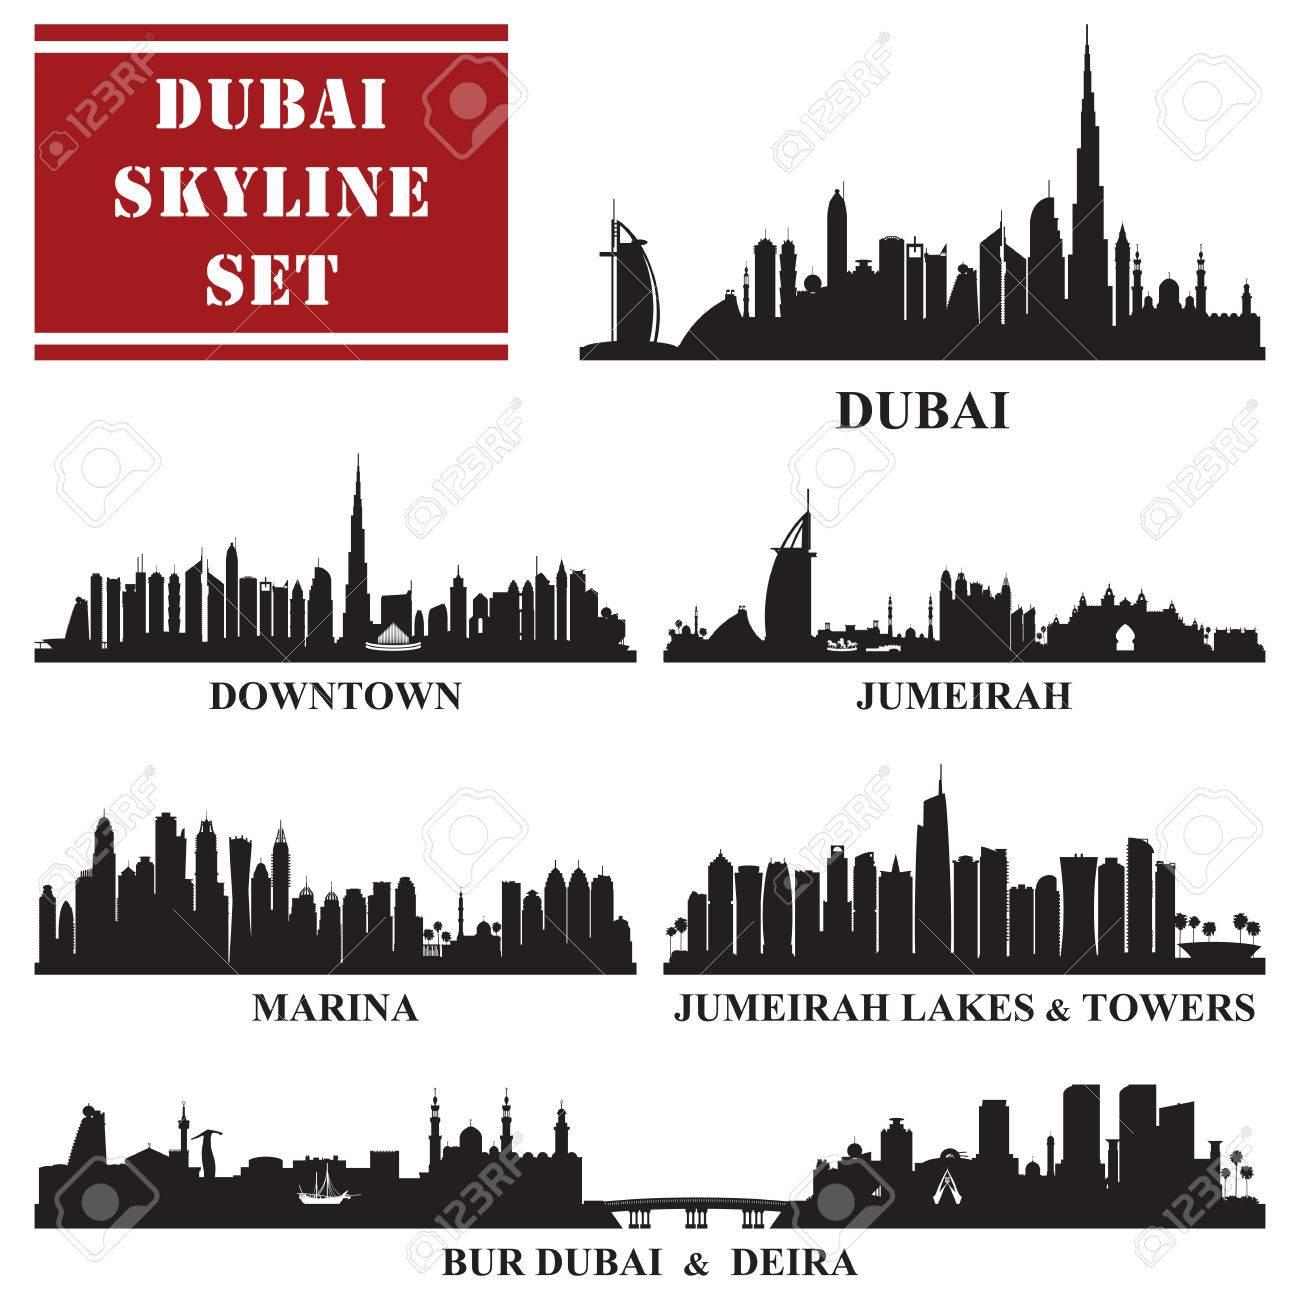 Set of Dubai districts, vector illustration - 55014790